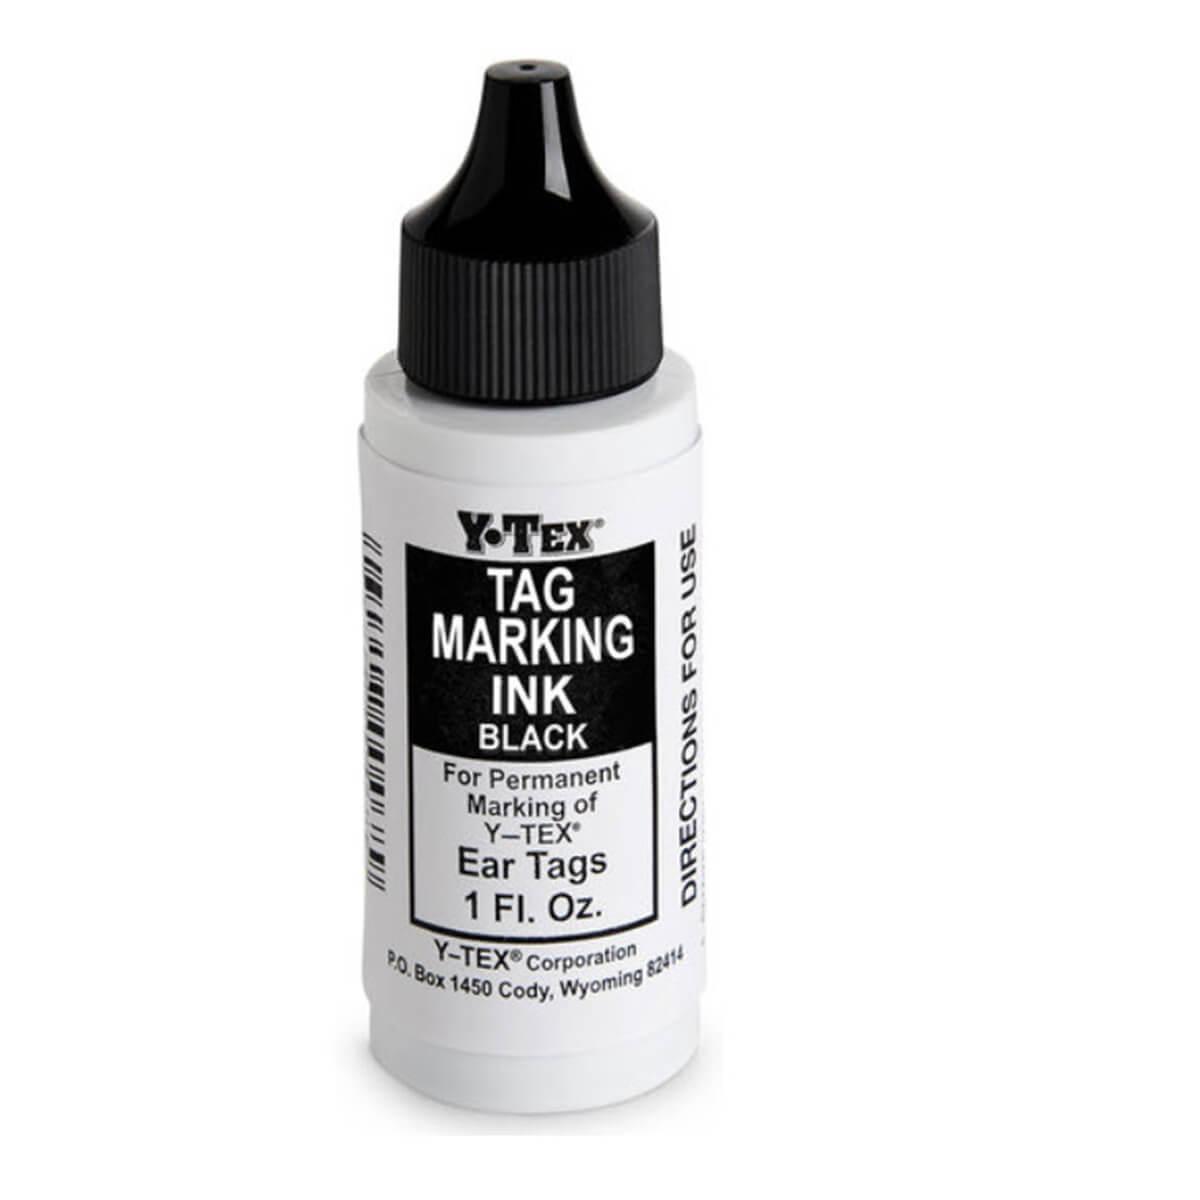 Y-Tex Tag Marking Ink - Black